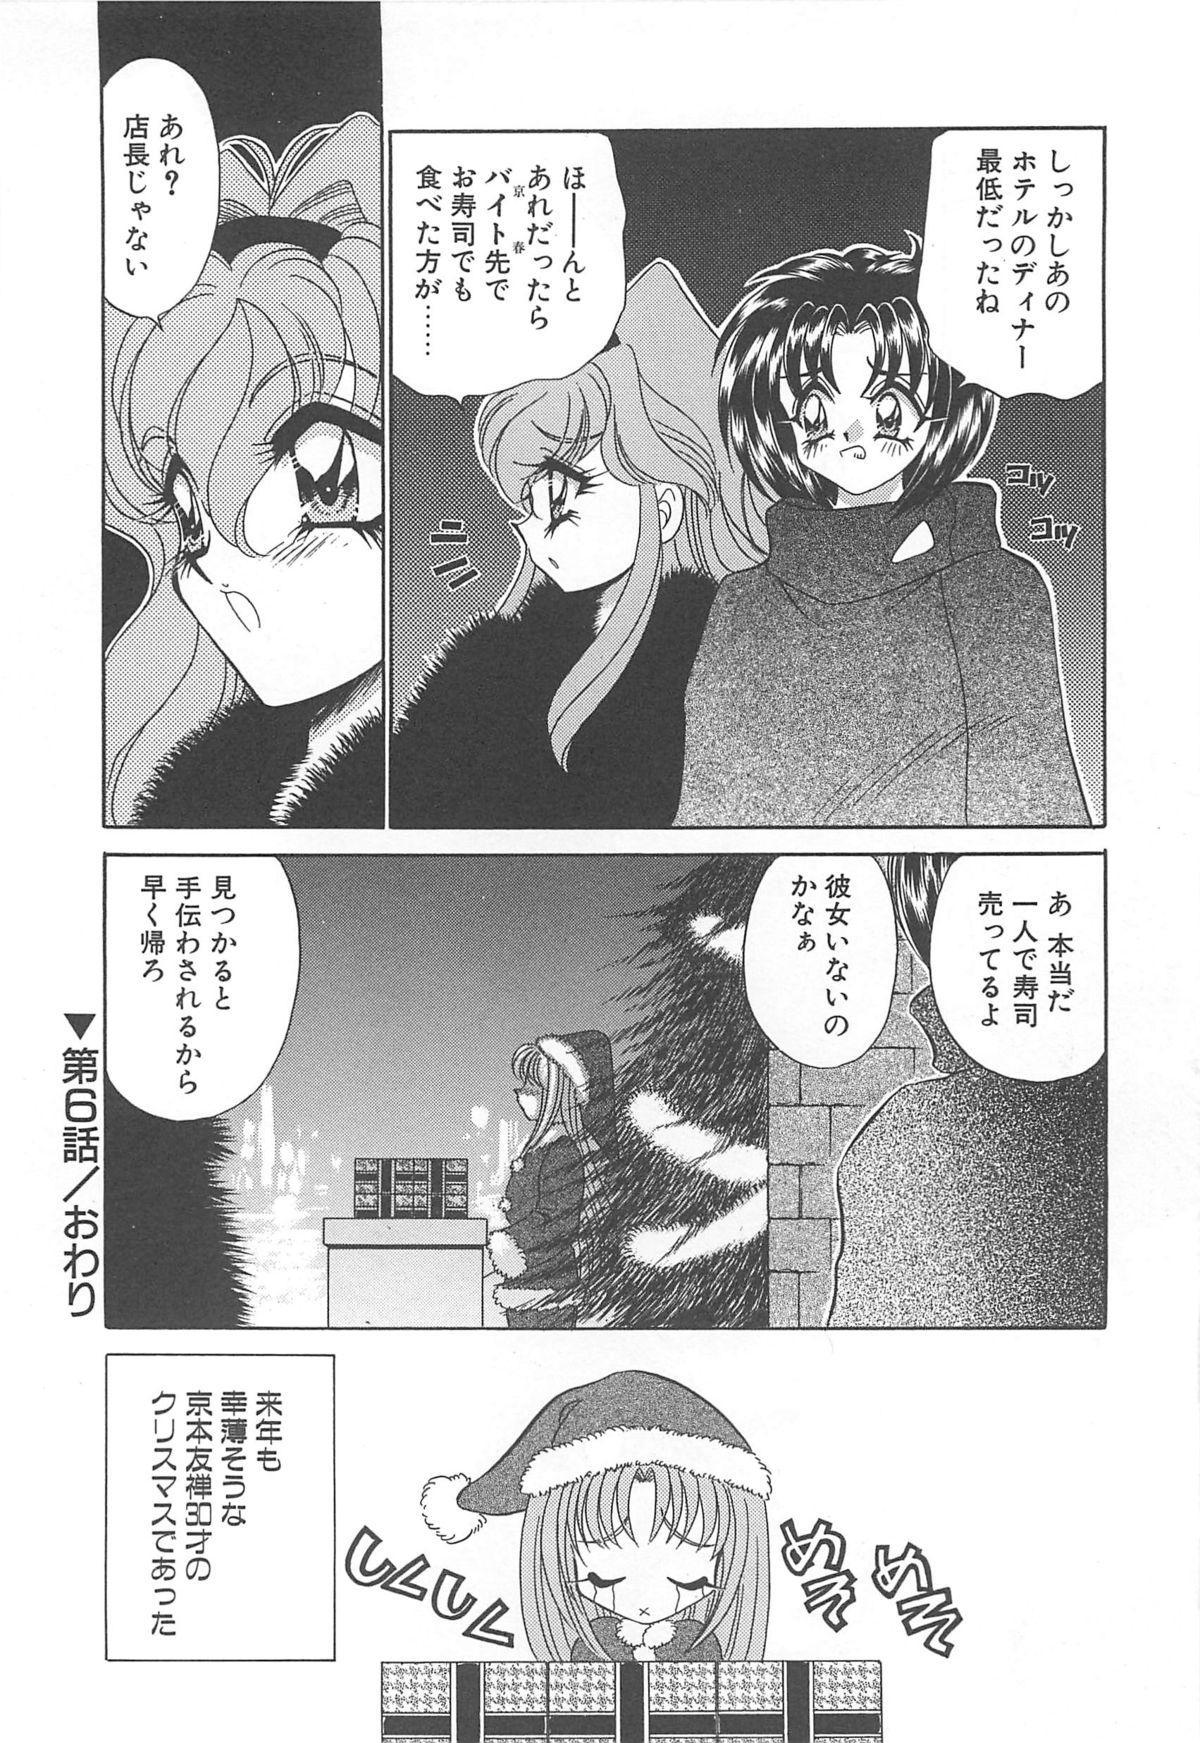 Kigurumi Sentai Quiltian 104